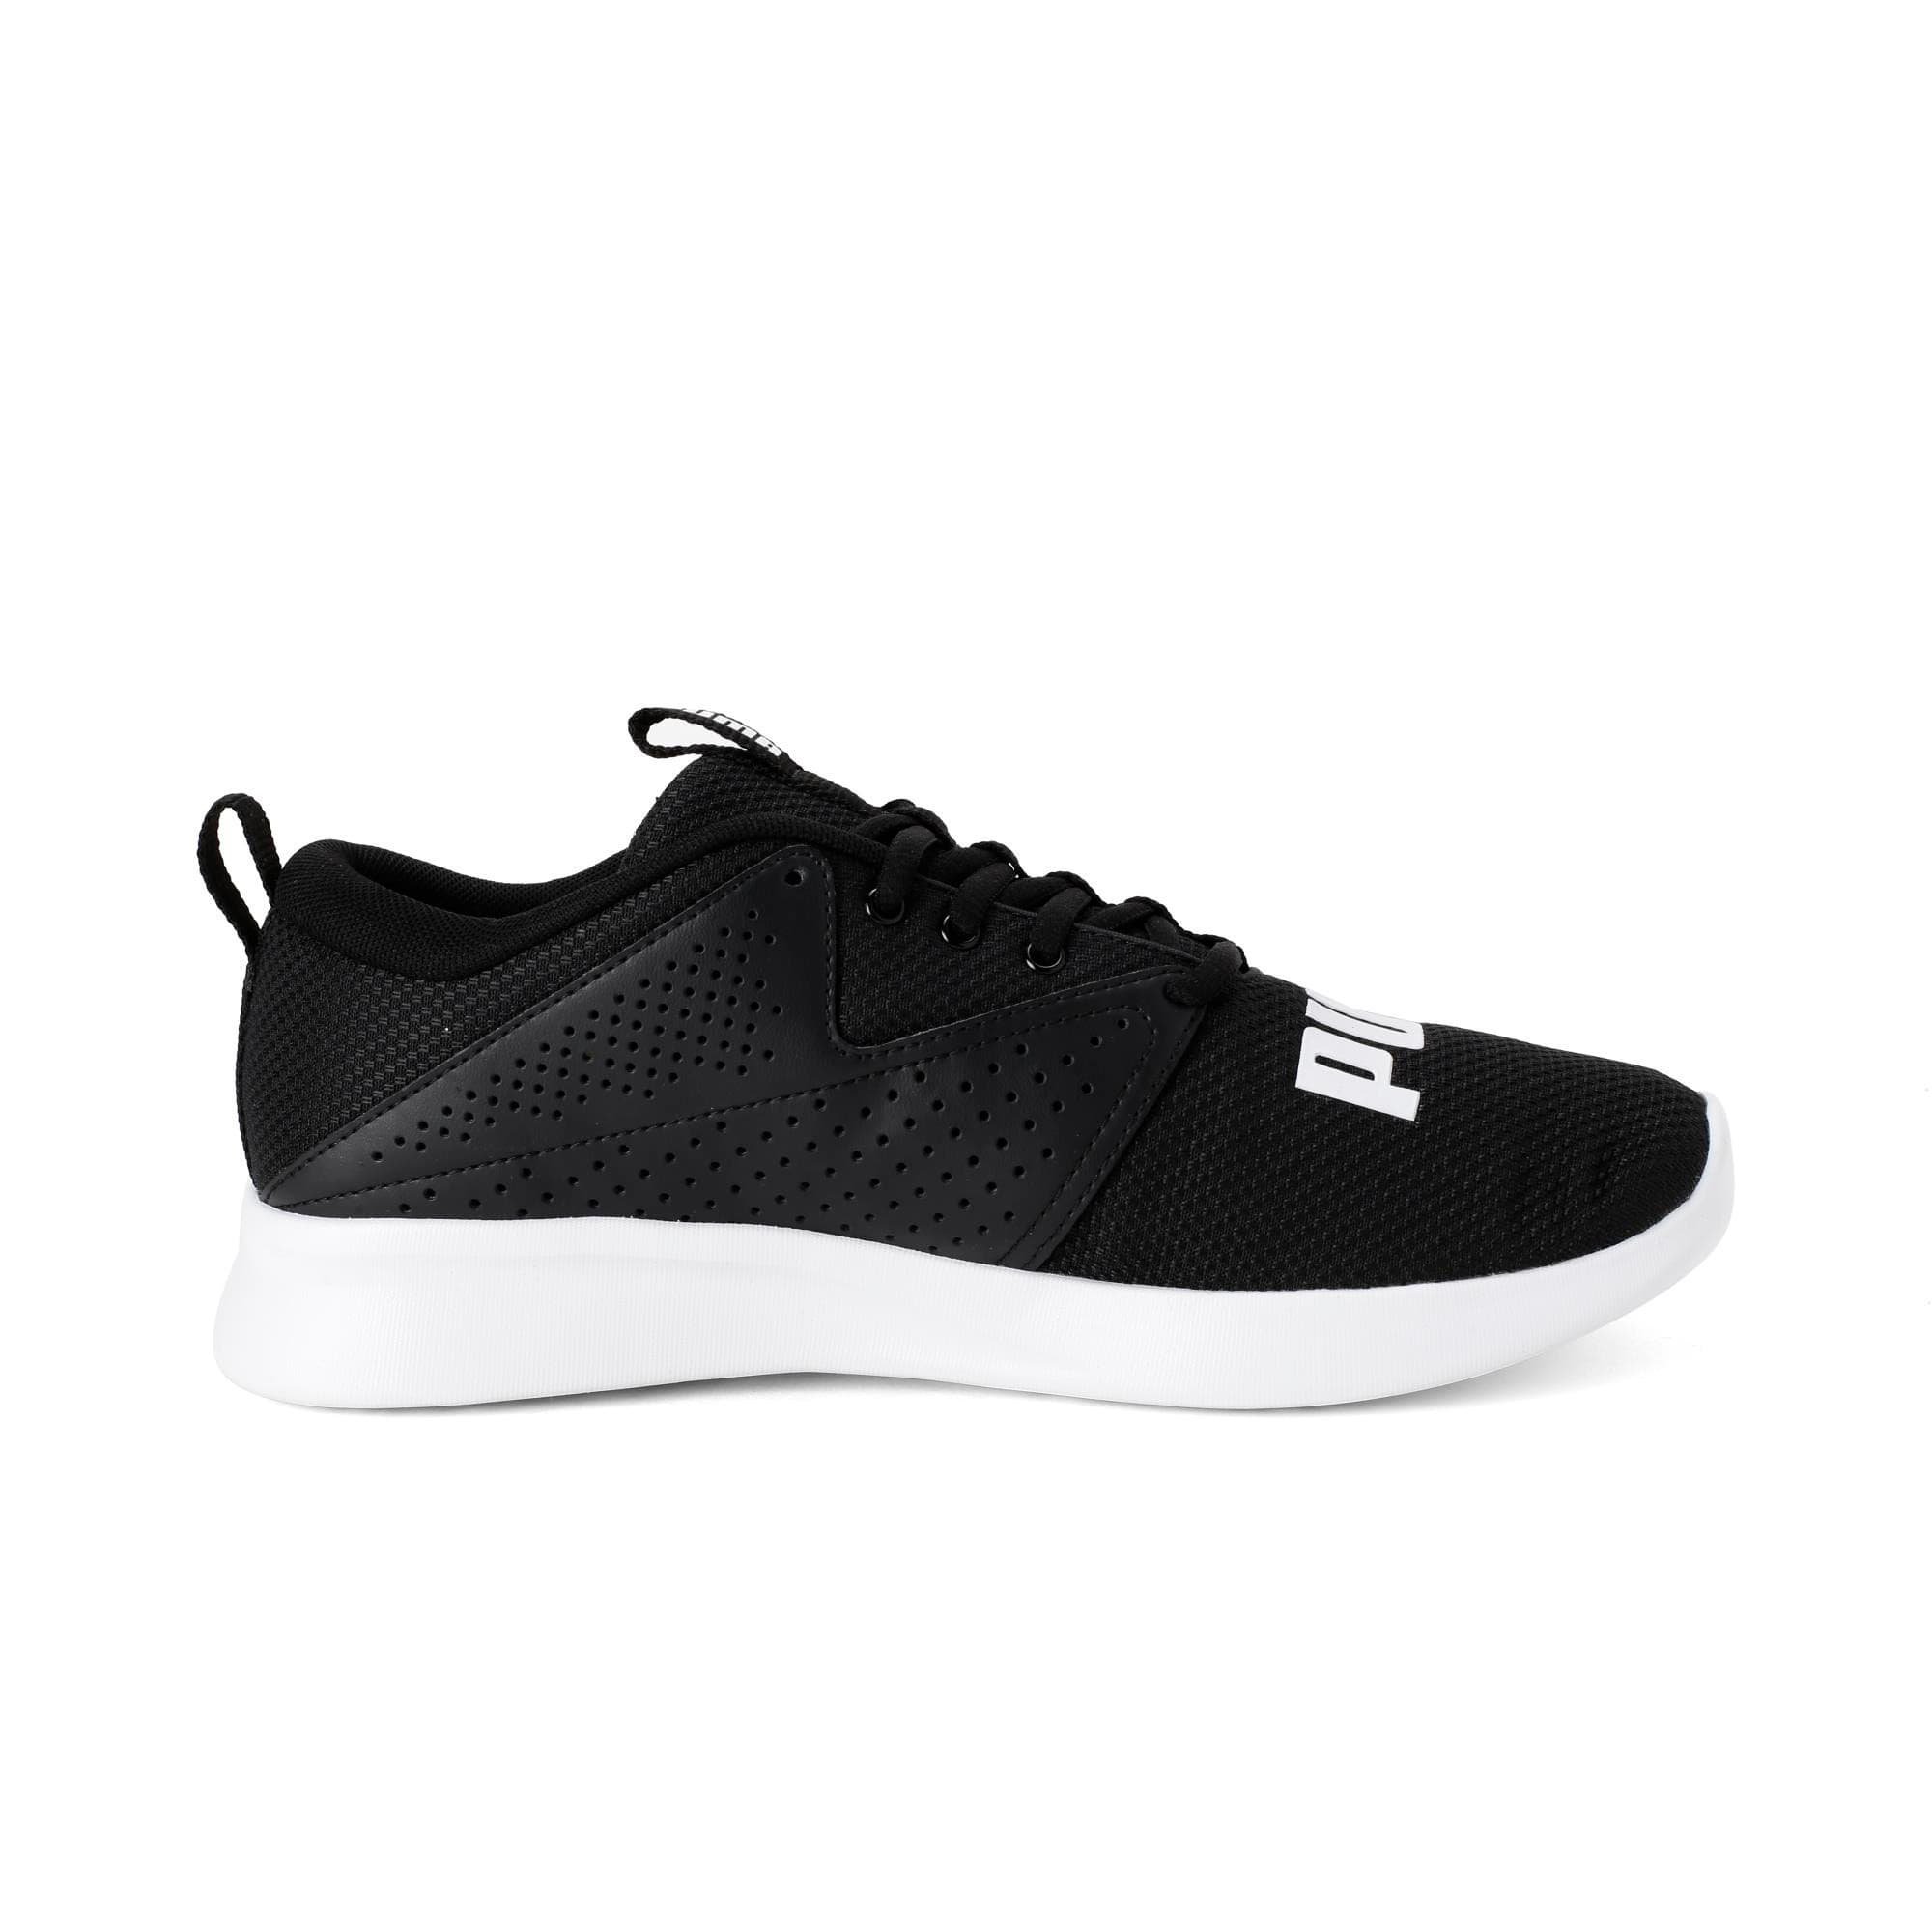 Thumbnail 5 of Detector Men's Running Shoe, Puma Black-Puma White, medium-IND